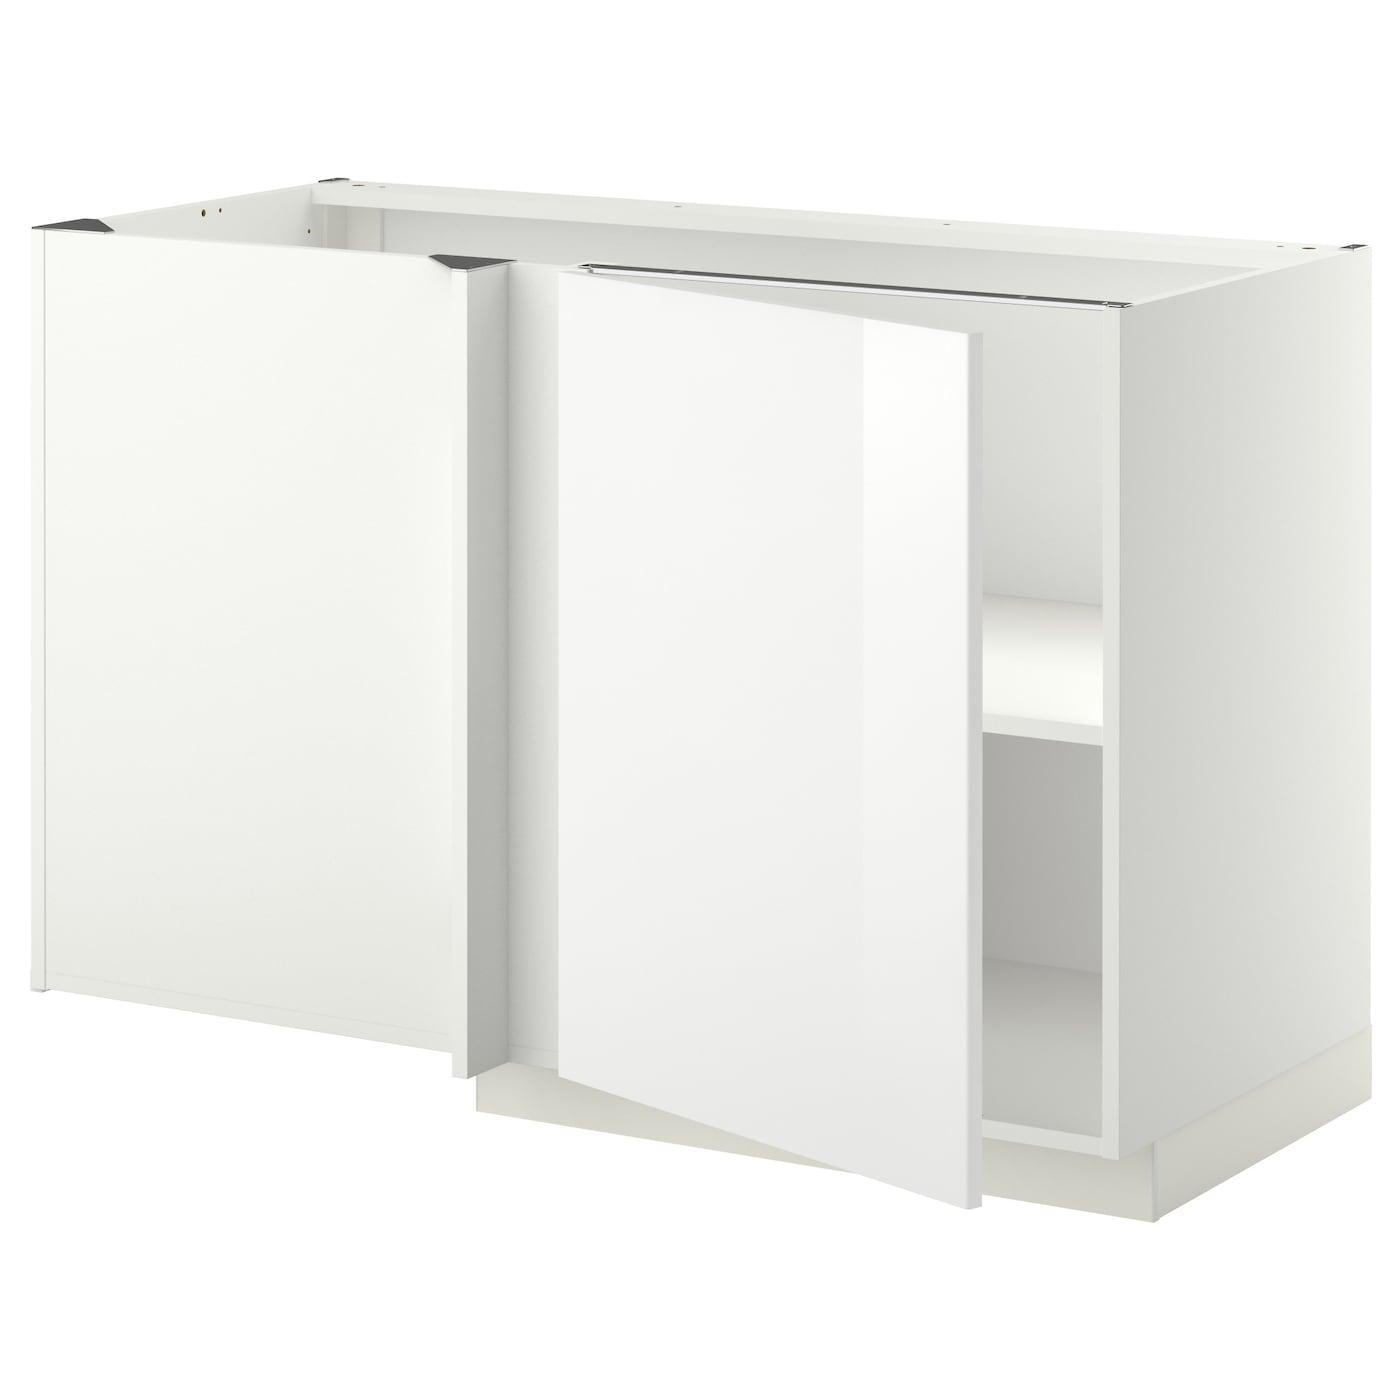 METOD Corner base cabinet with shelf White/ringhult white 128 x 68 ...